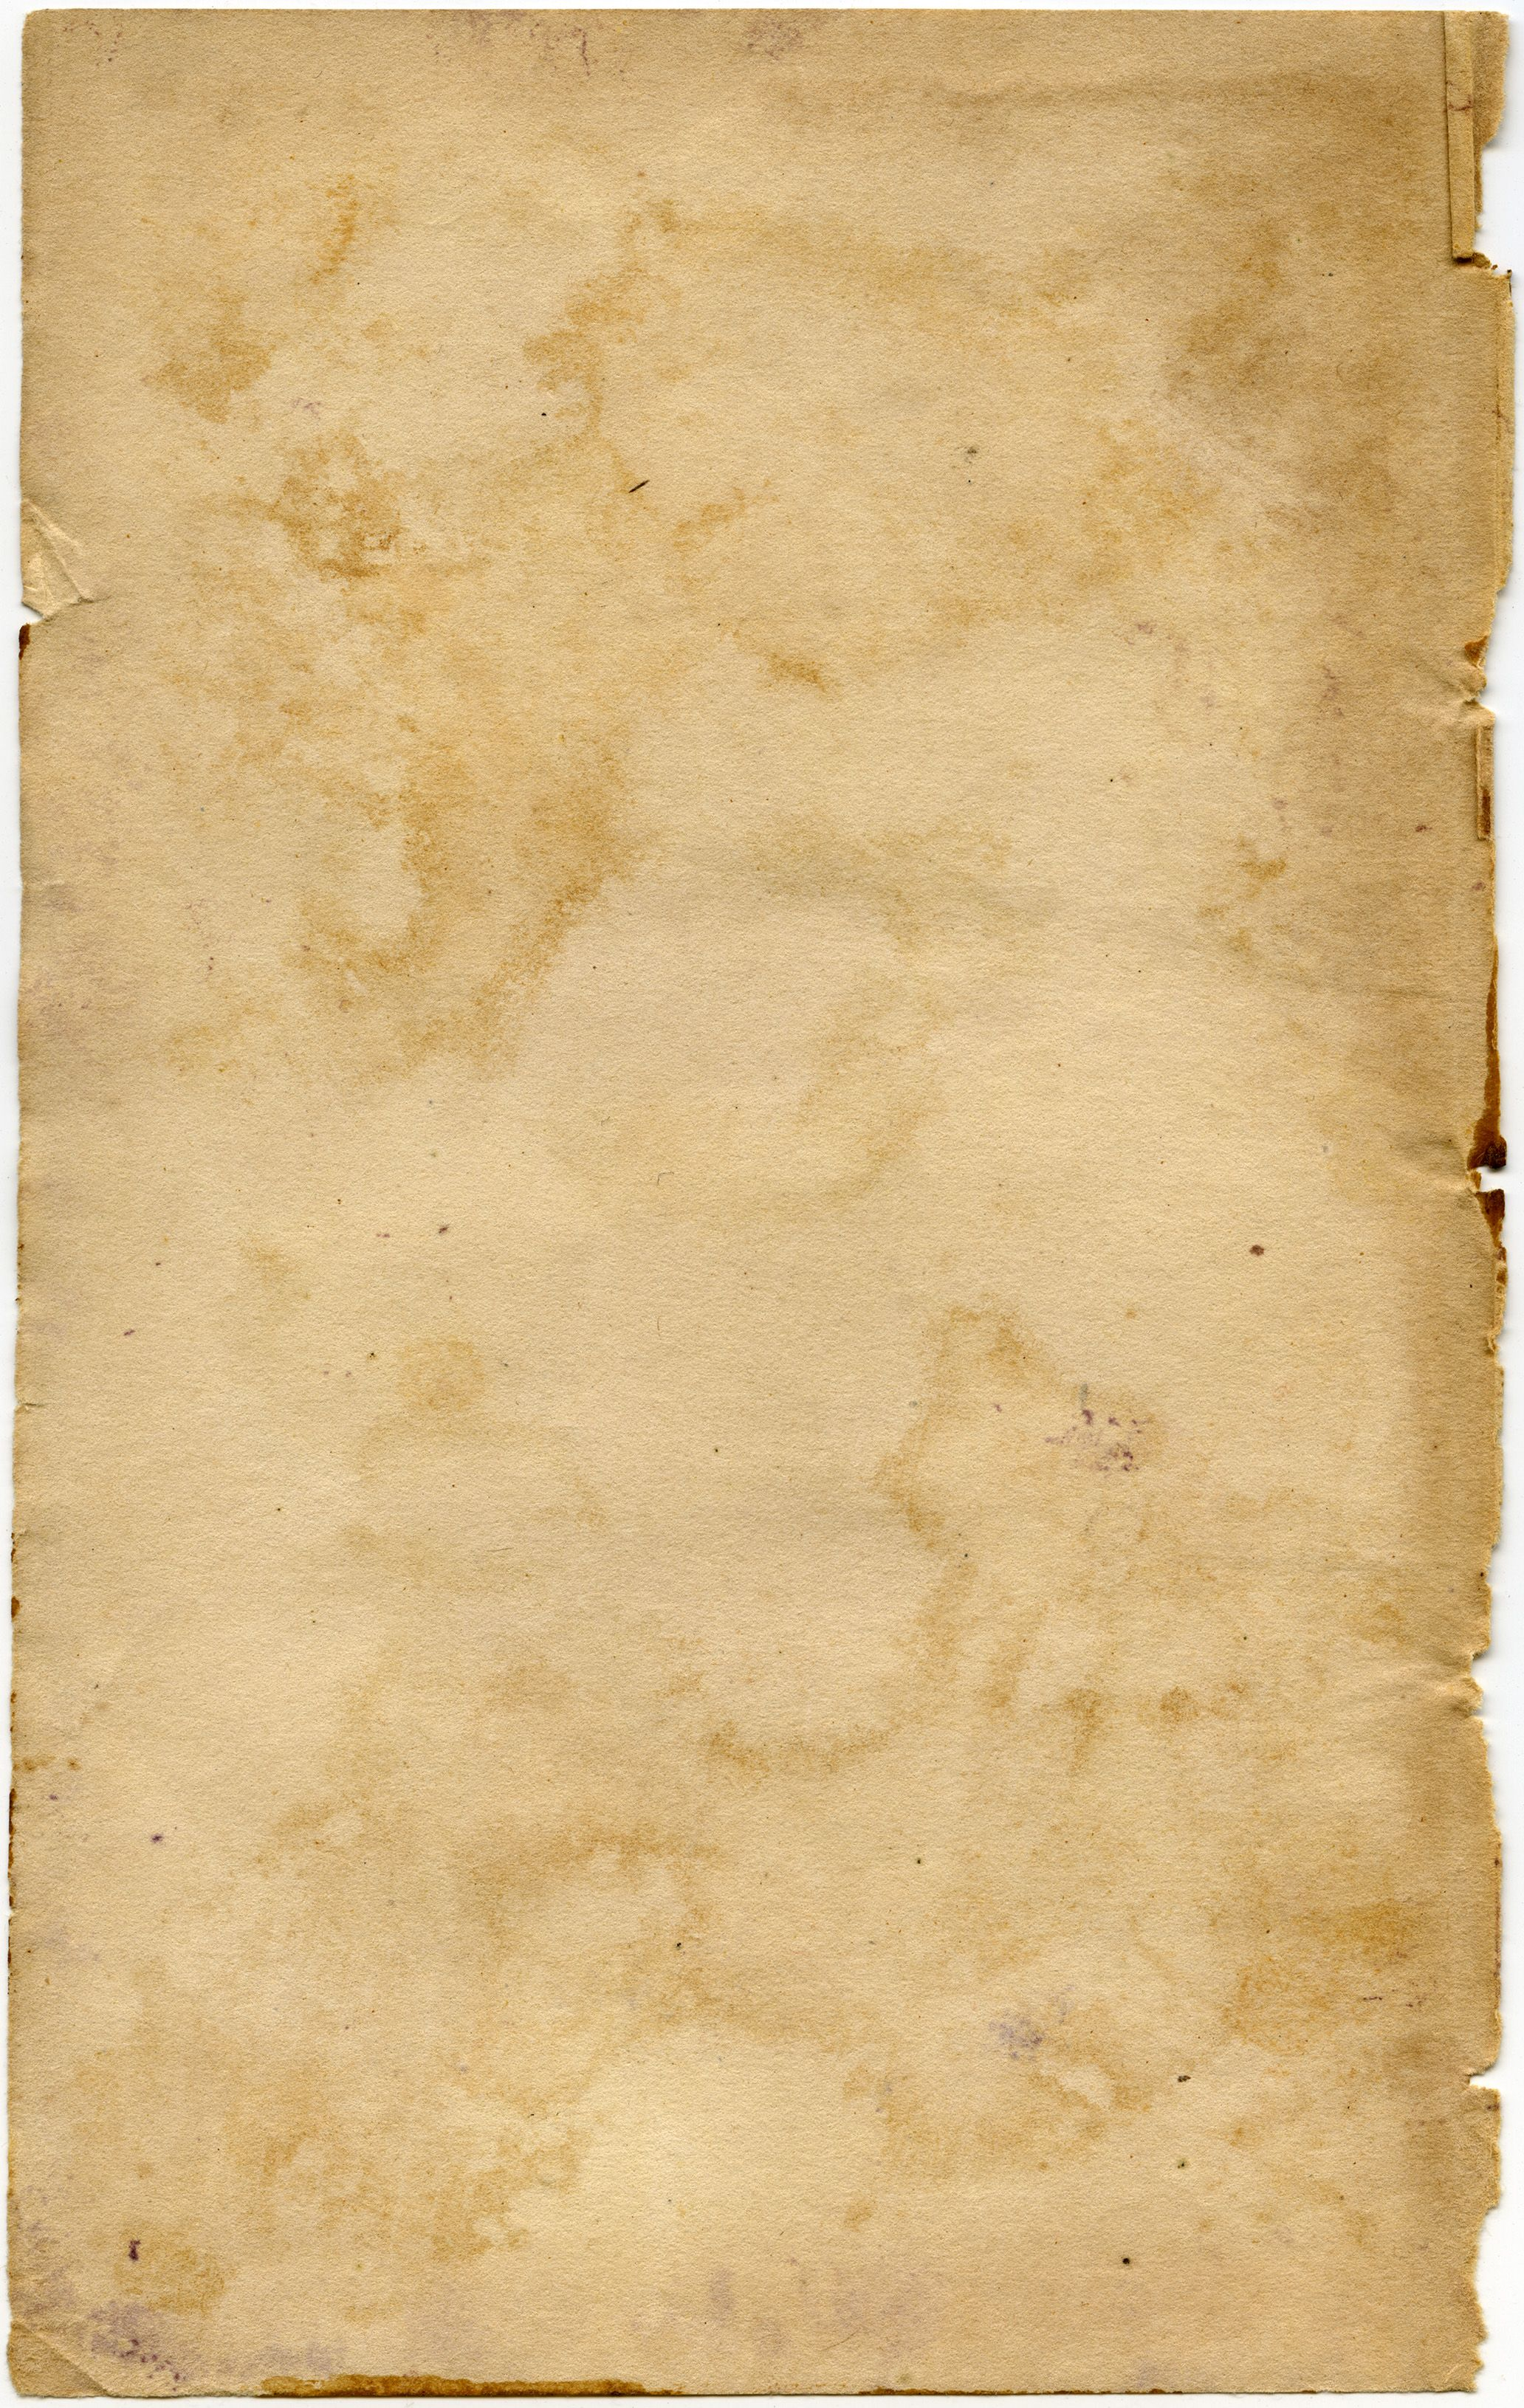 Modern aged paper photo